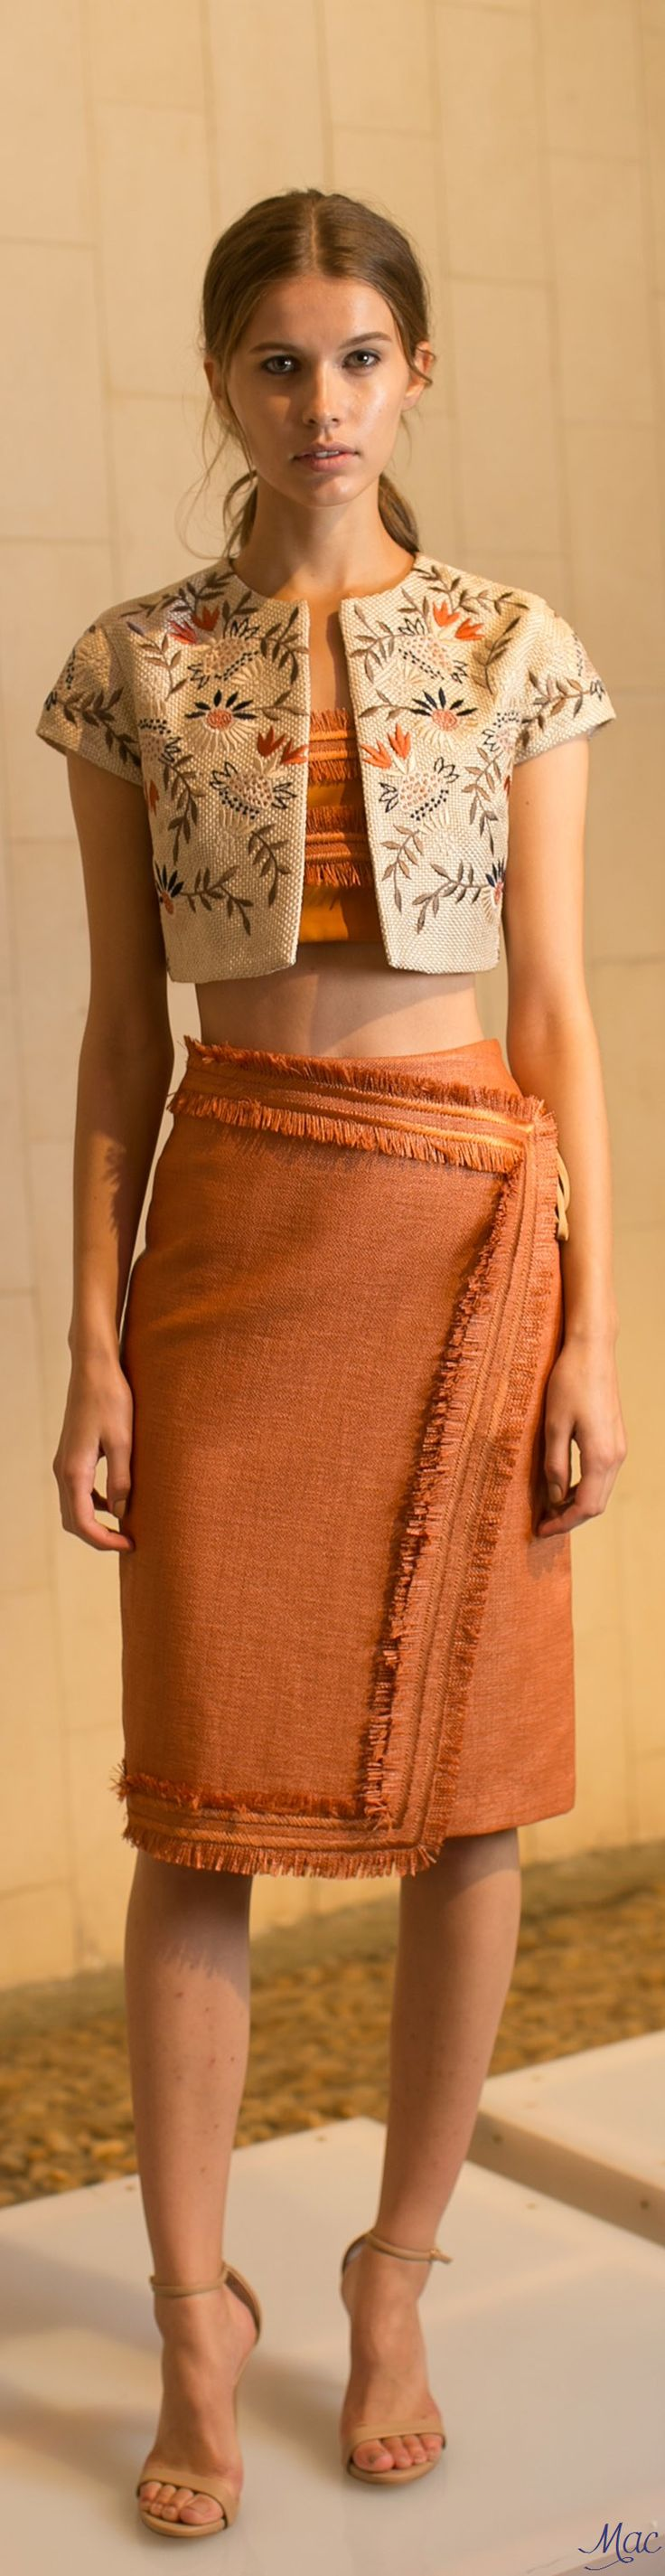 Spring 2017 Ready-to-Wear Josie Natori